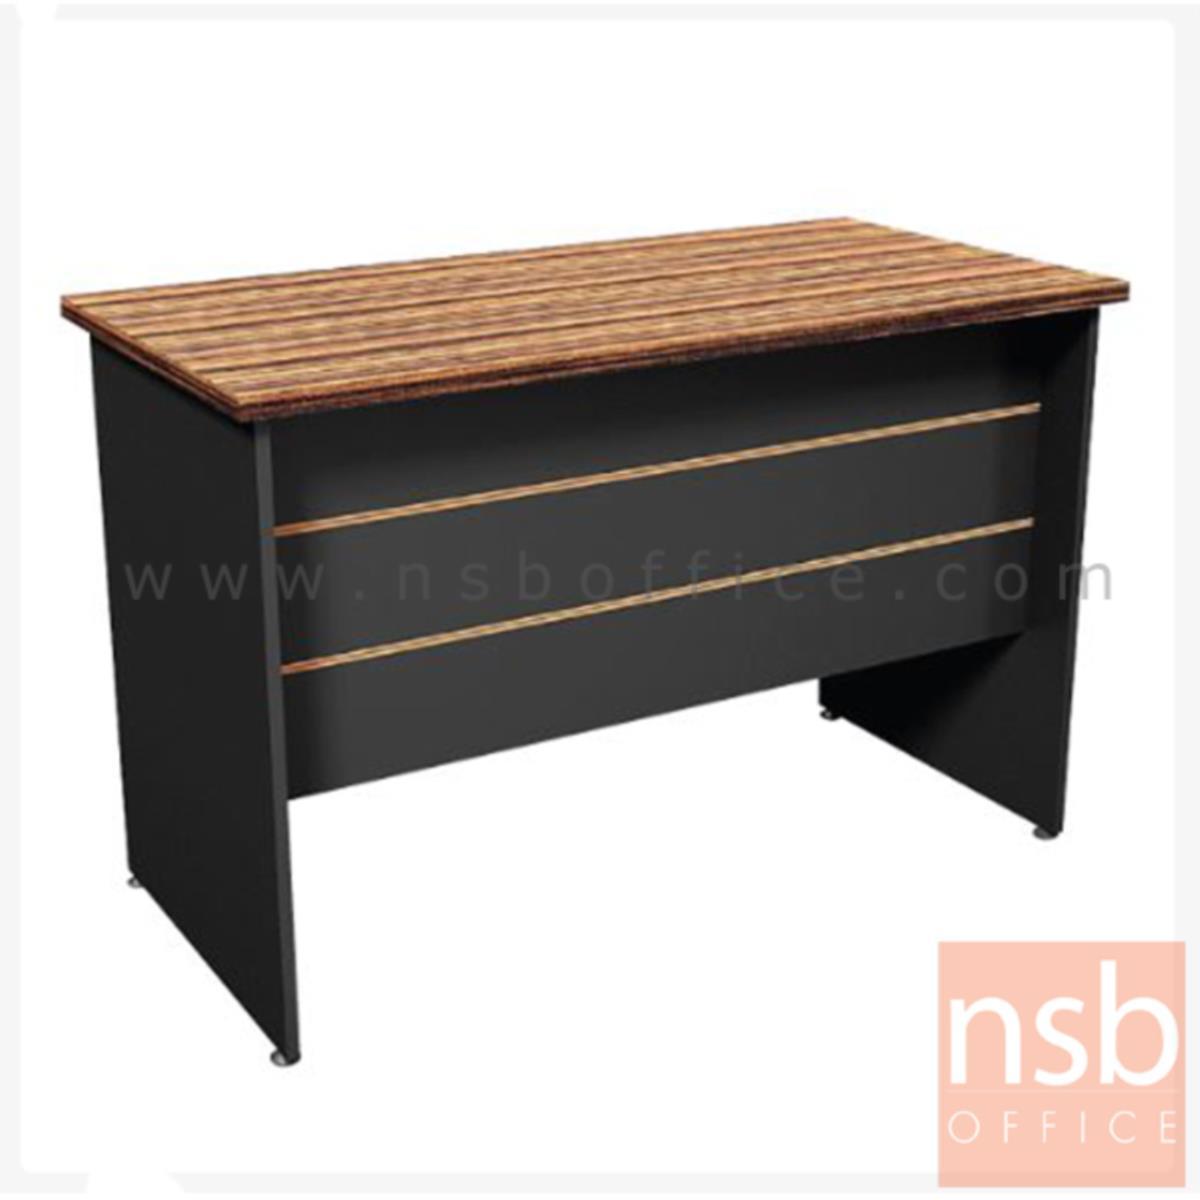 A26A018:โต๊ะทำงาน รุ่น Denton (เดนตัน) ขนาด 120W ,150W cm.  ขาไม้ สีลายไม้ซีบราโน่ตัดดำ ขอบ ROSEGOLD